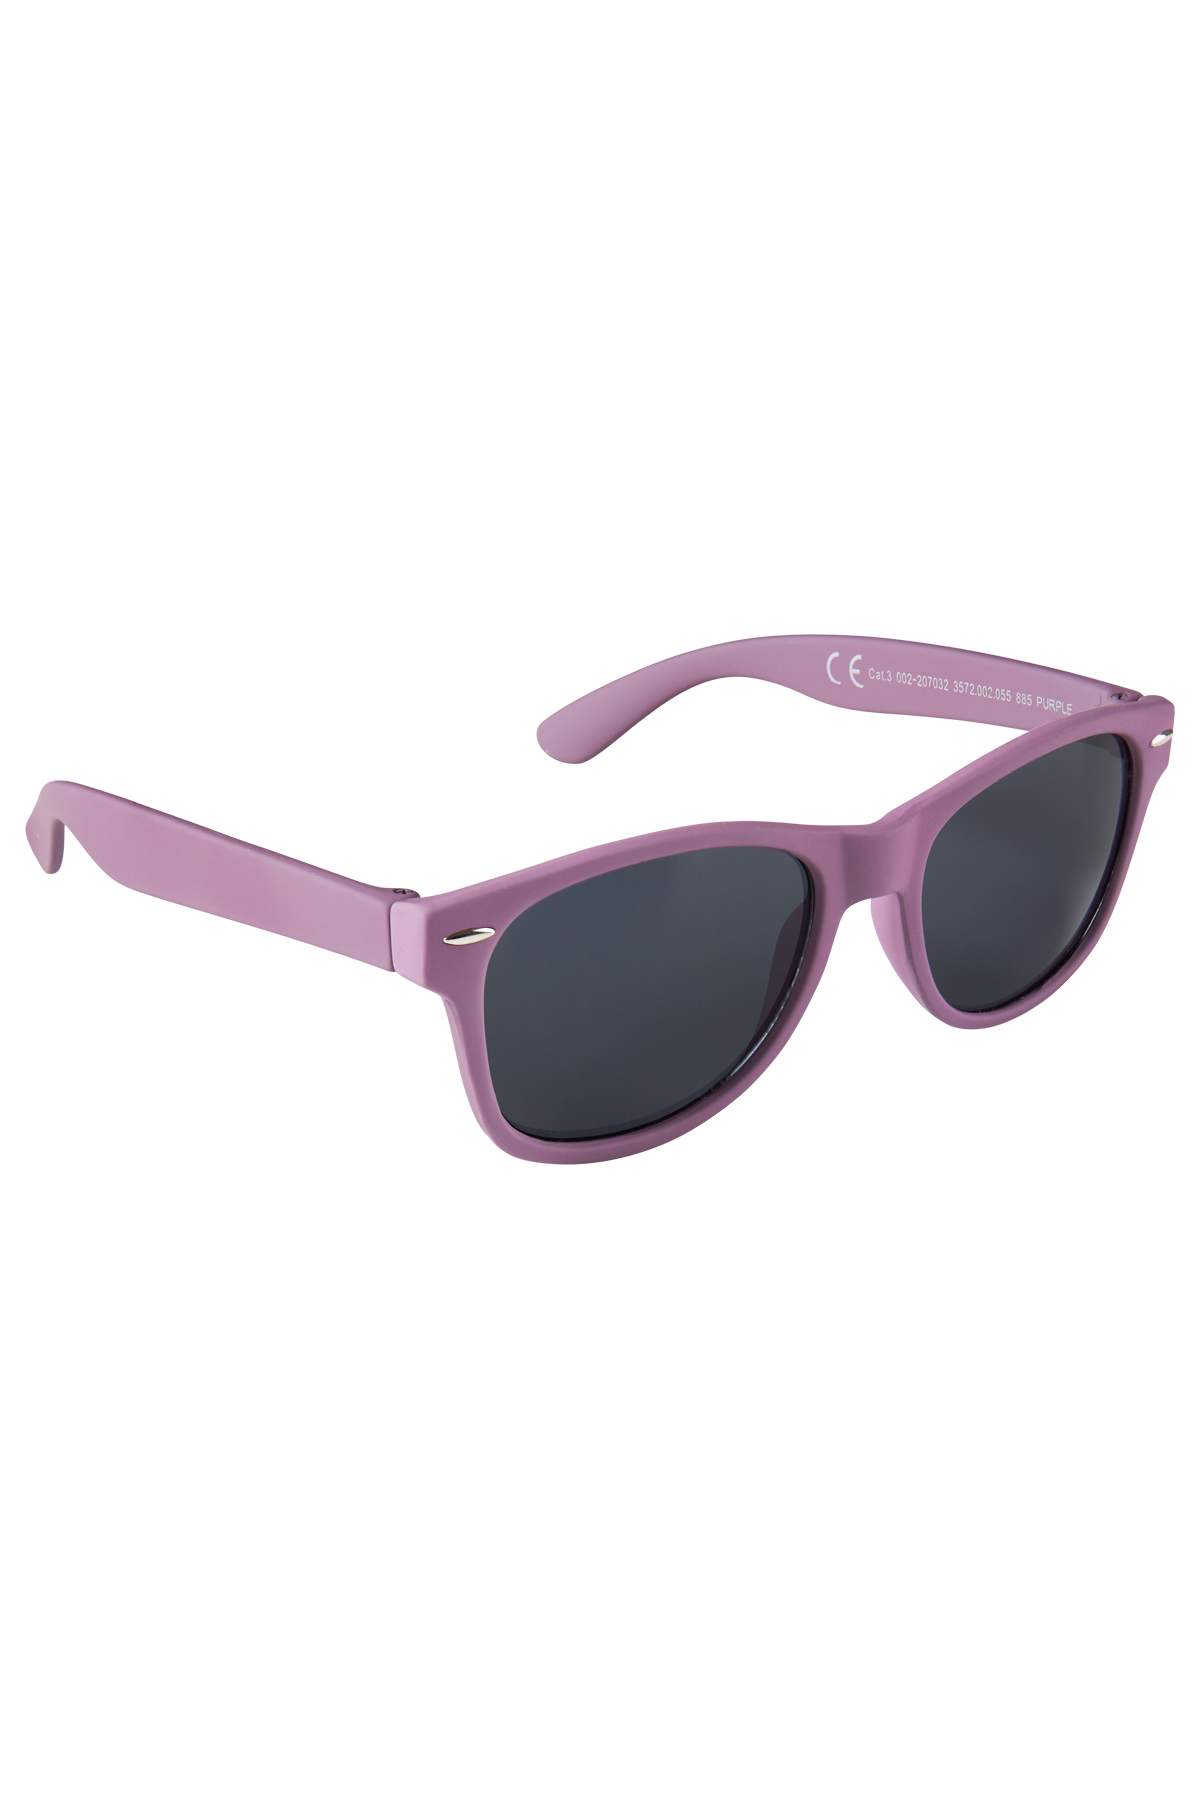 Sun glasses Telma